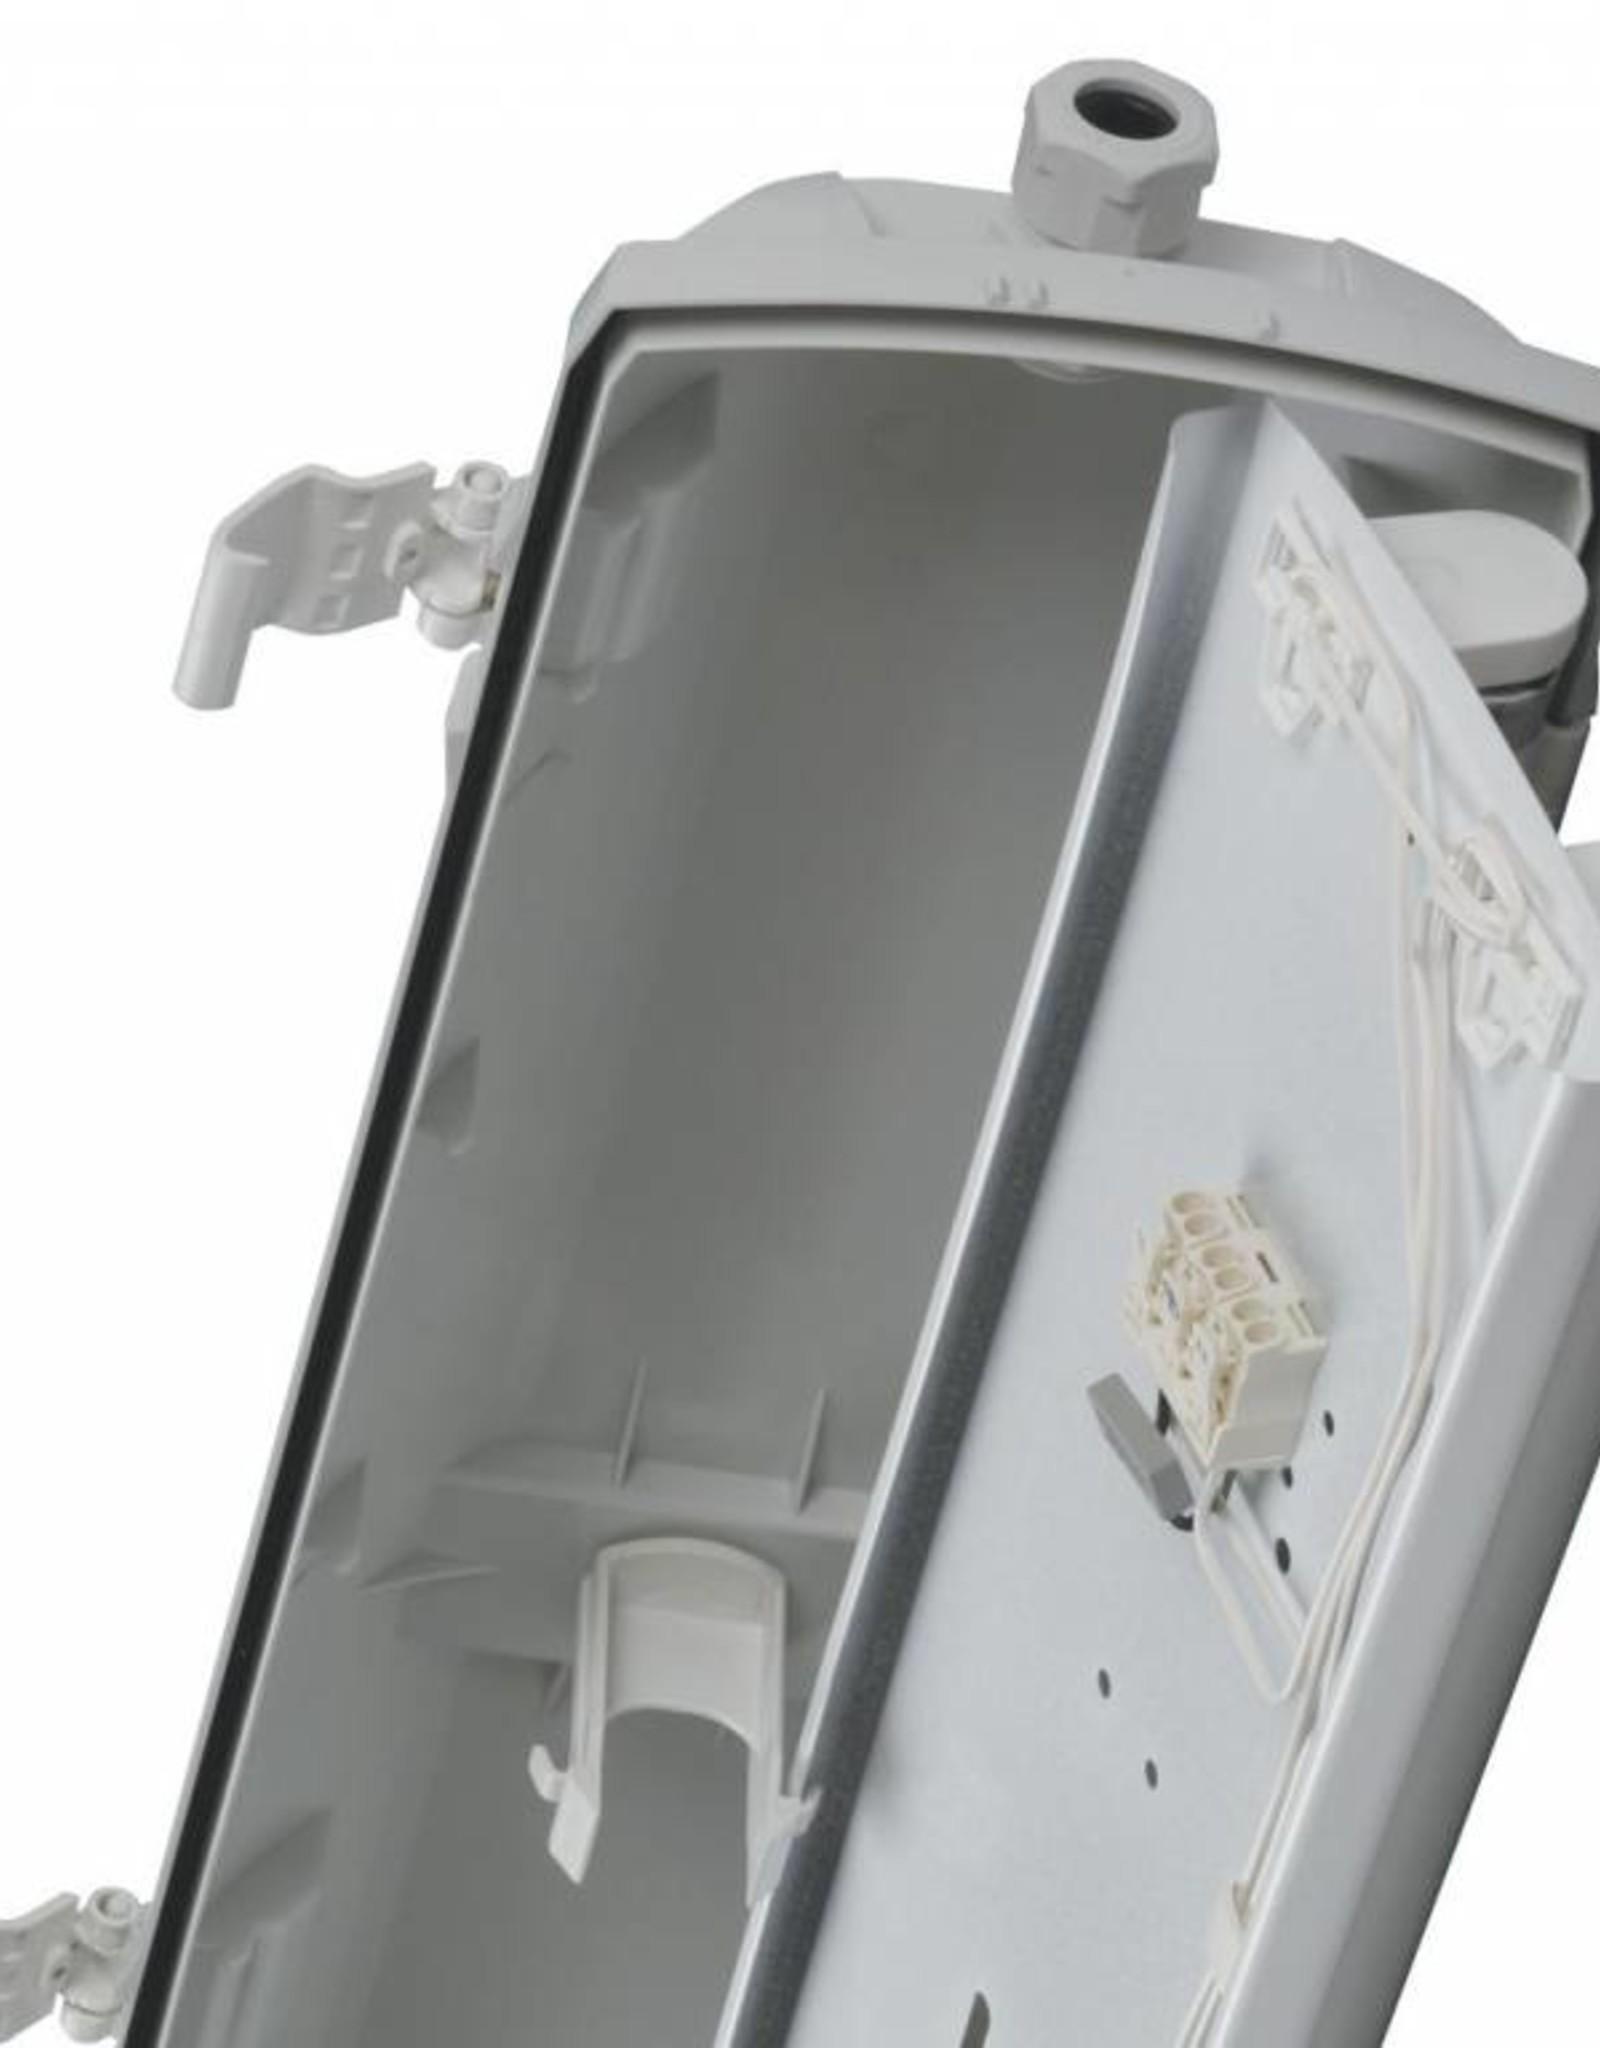 Prima 1x28W HE - ABS - inox clips - HF ballast